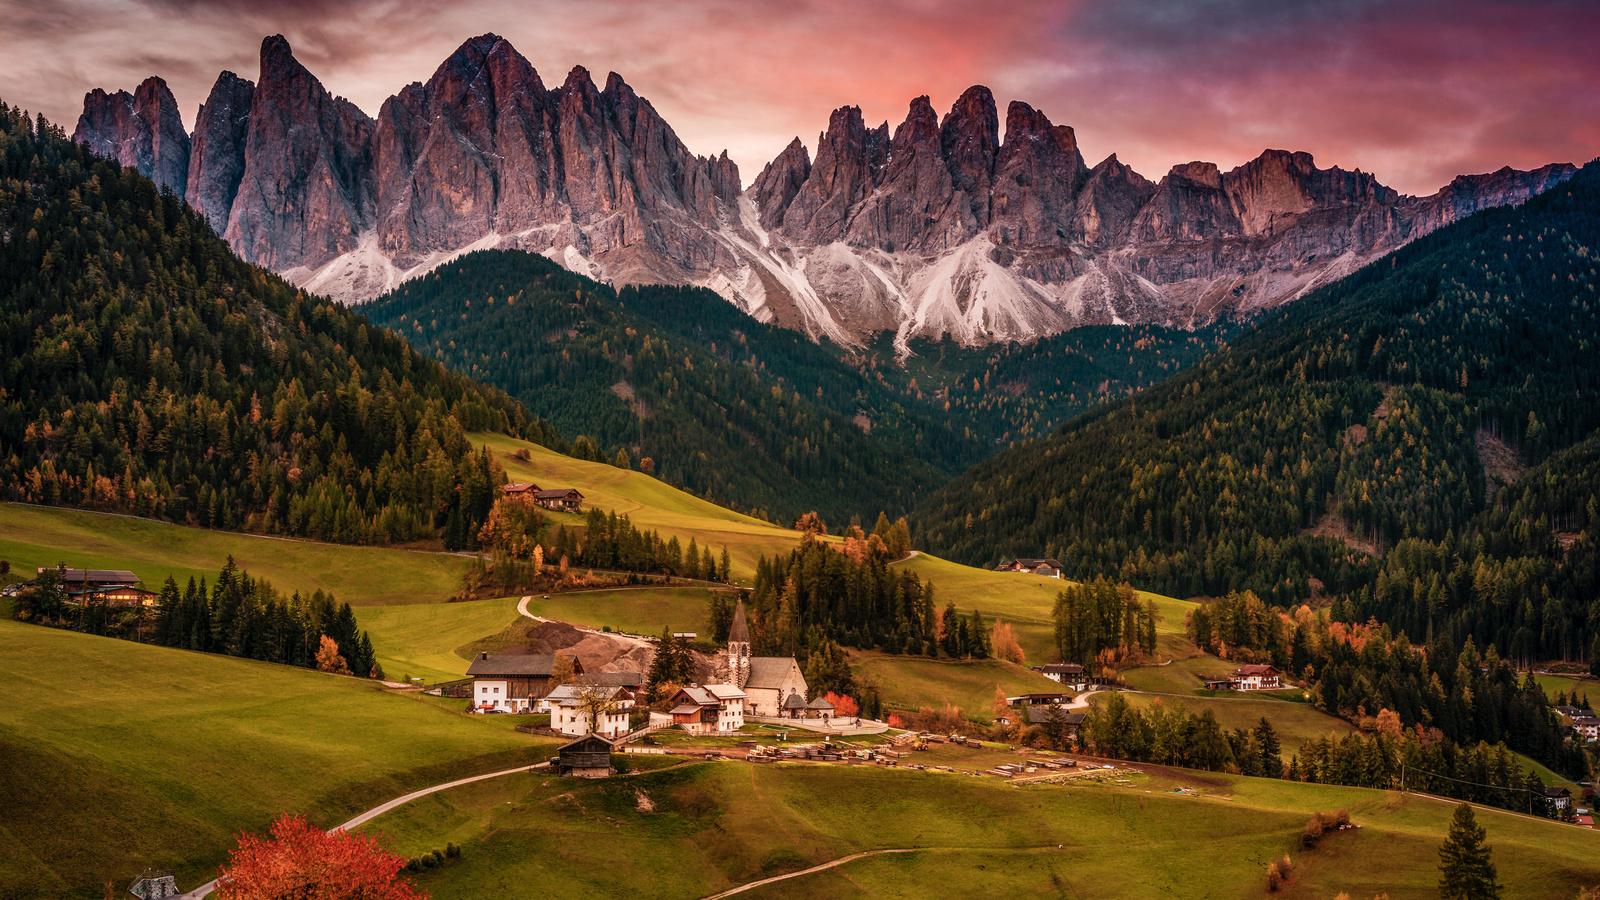 италия, горы, луг, пейзаж, santa maddalena, деревня, природа